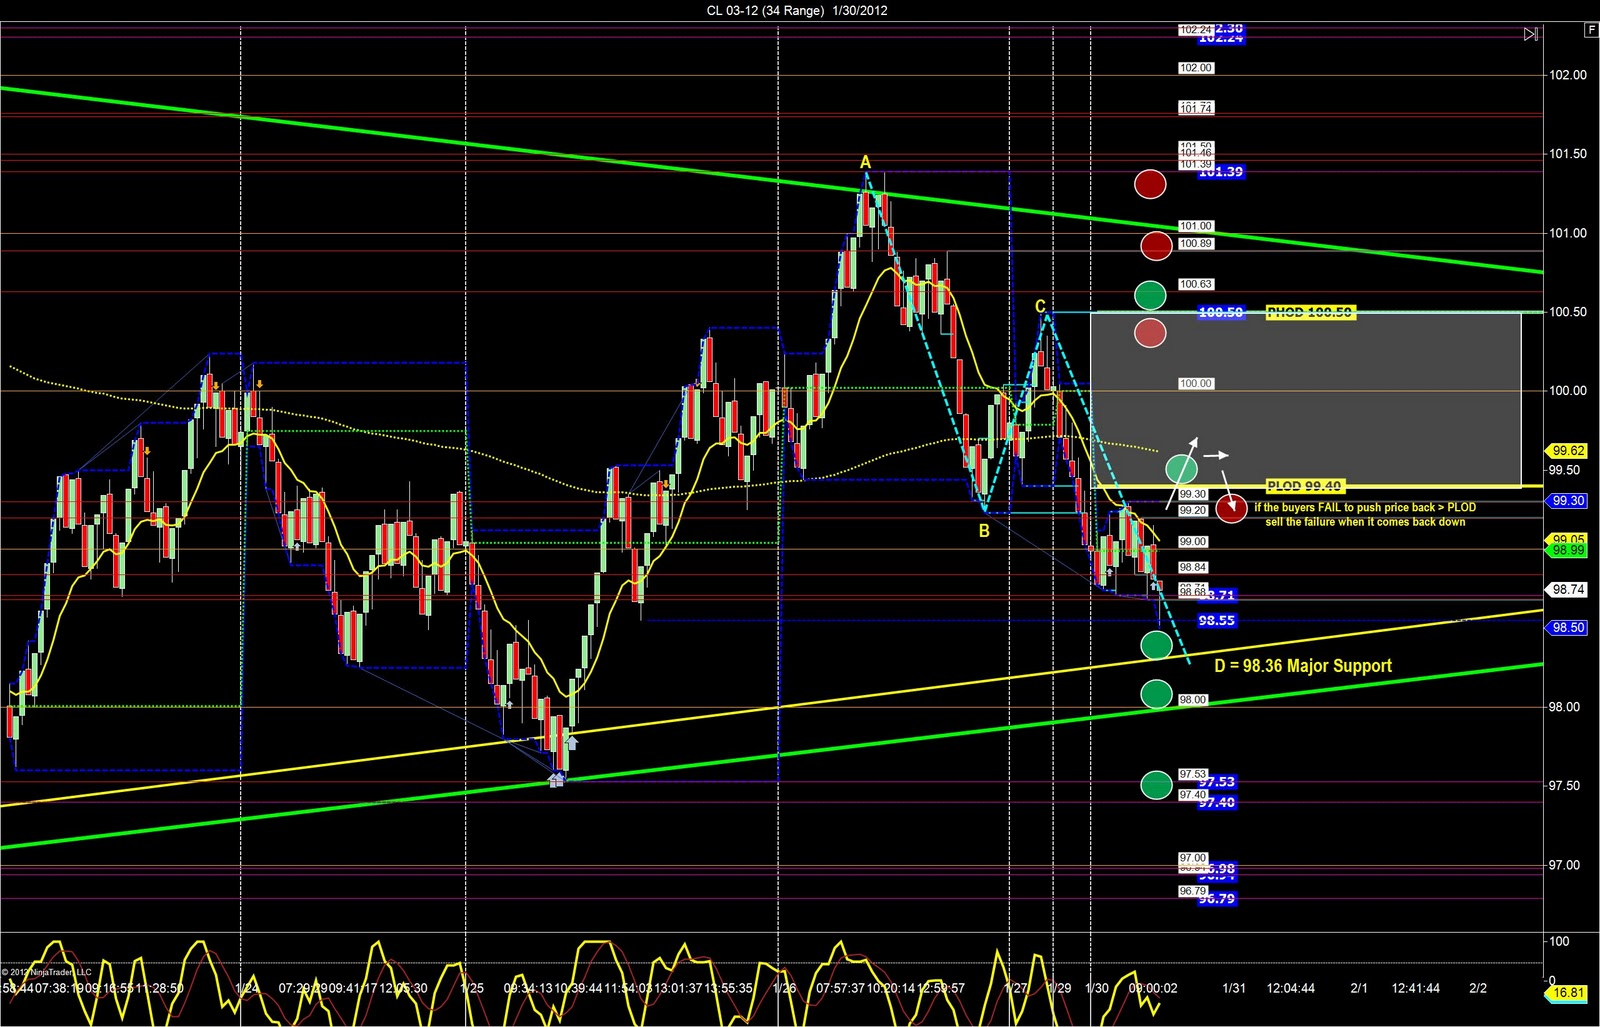 Trading ab 1 euro